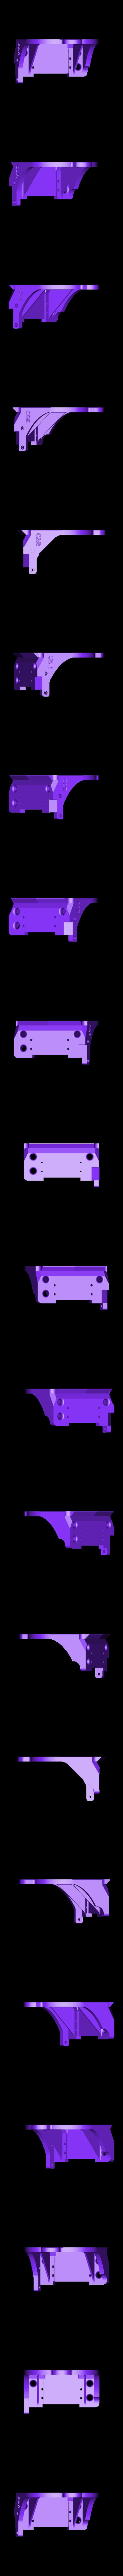 TAZ5_Titan_X_Mount_v6.stl Download free STL file TAZ5 E3D Titan Mount Remixed with stronger back and heat insert holes • 3D printing design, crprinting